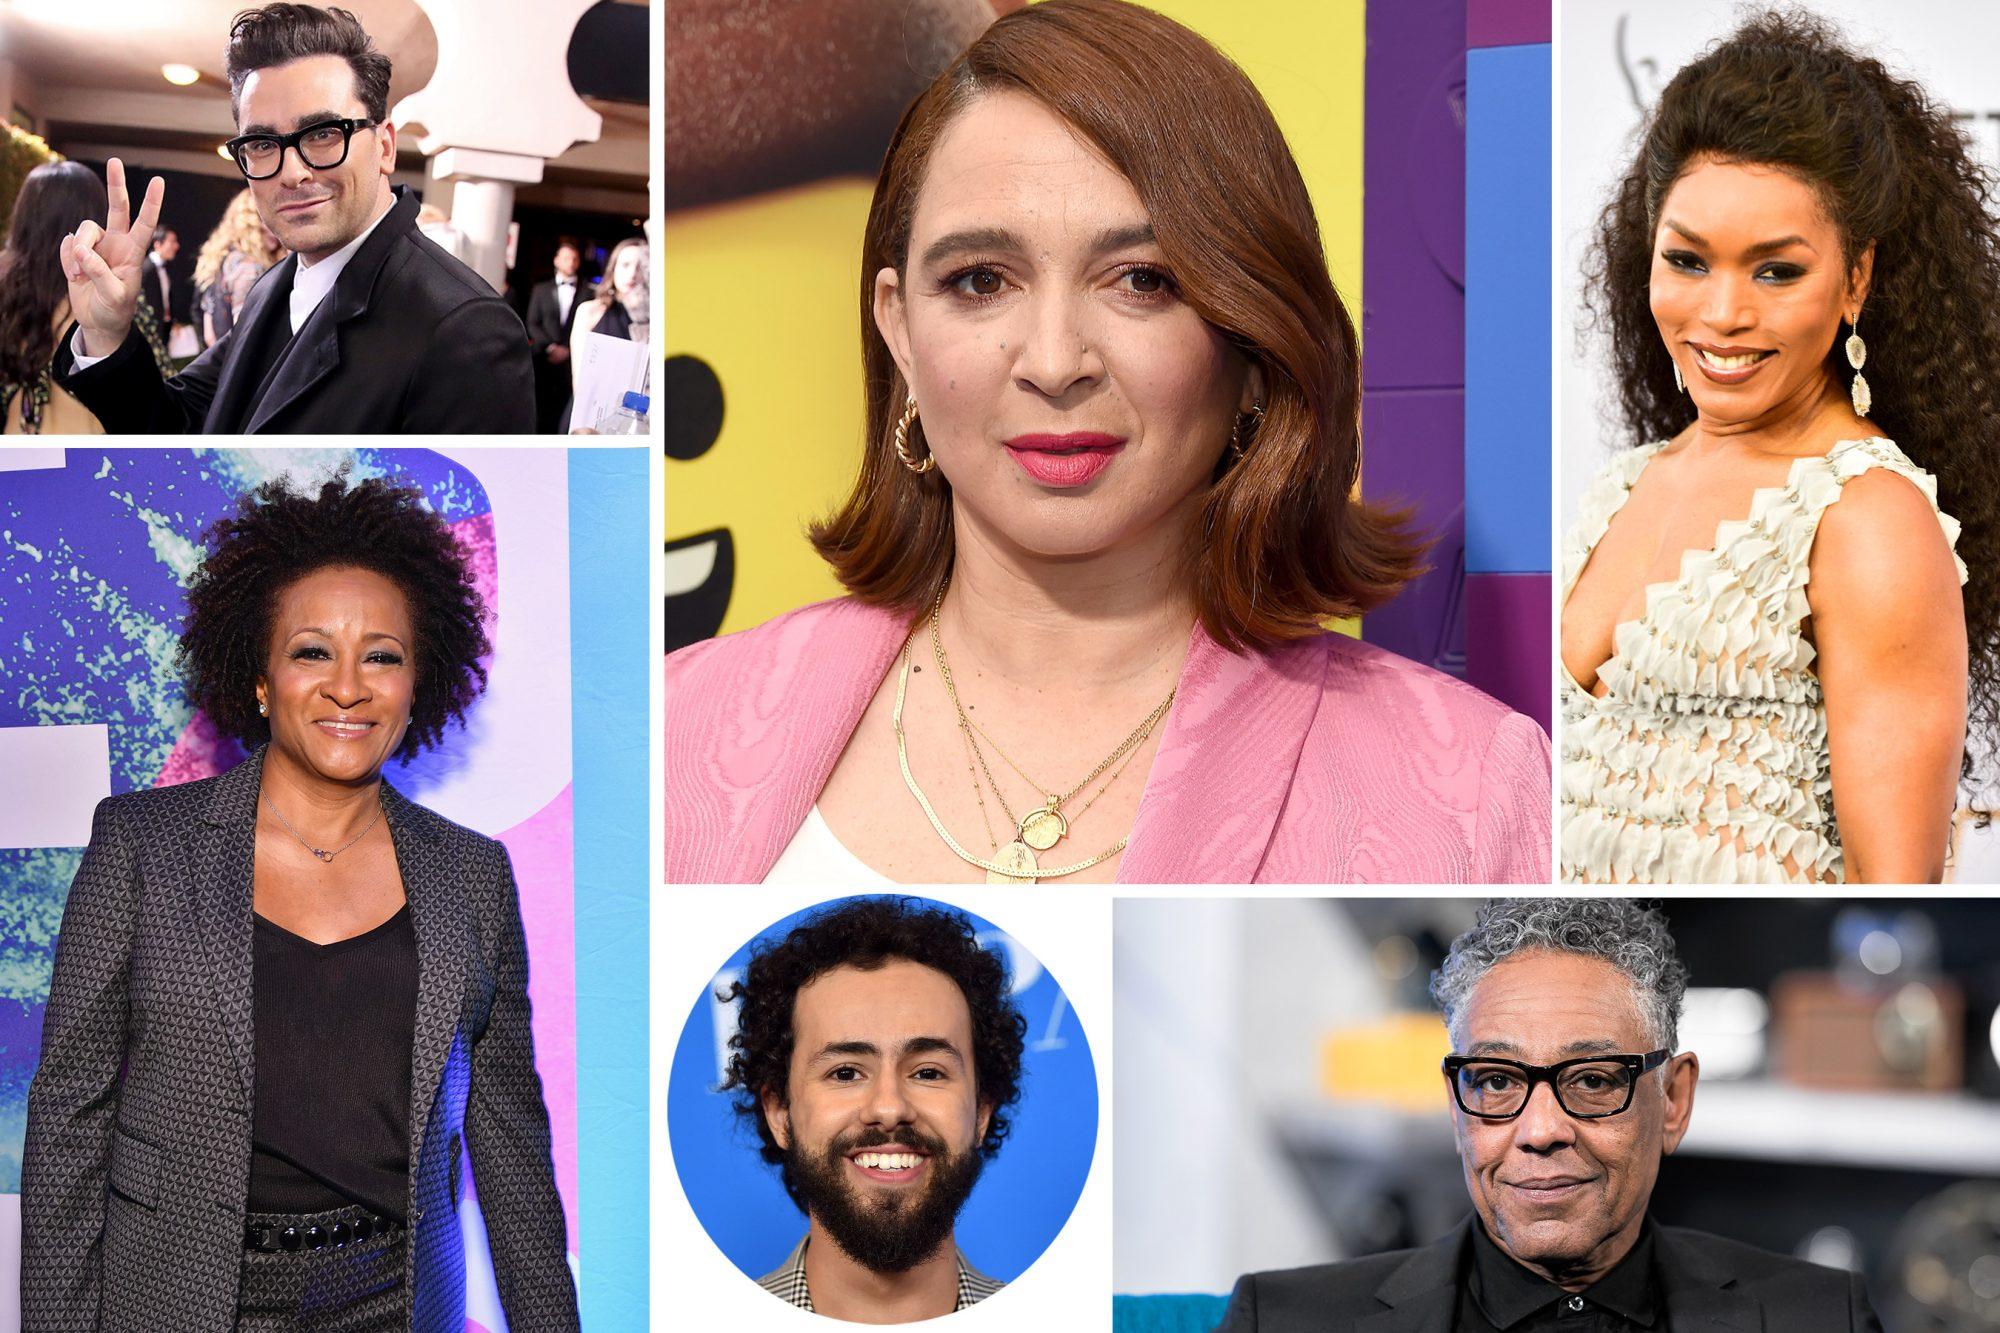 Angela Bassett, Dan Levy, Giancarlo Esposito, Maya Rudolph, Ramy Youssef, and Wanda Sykes